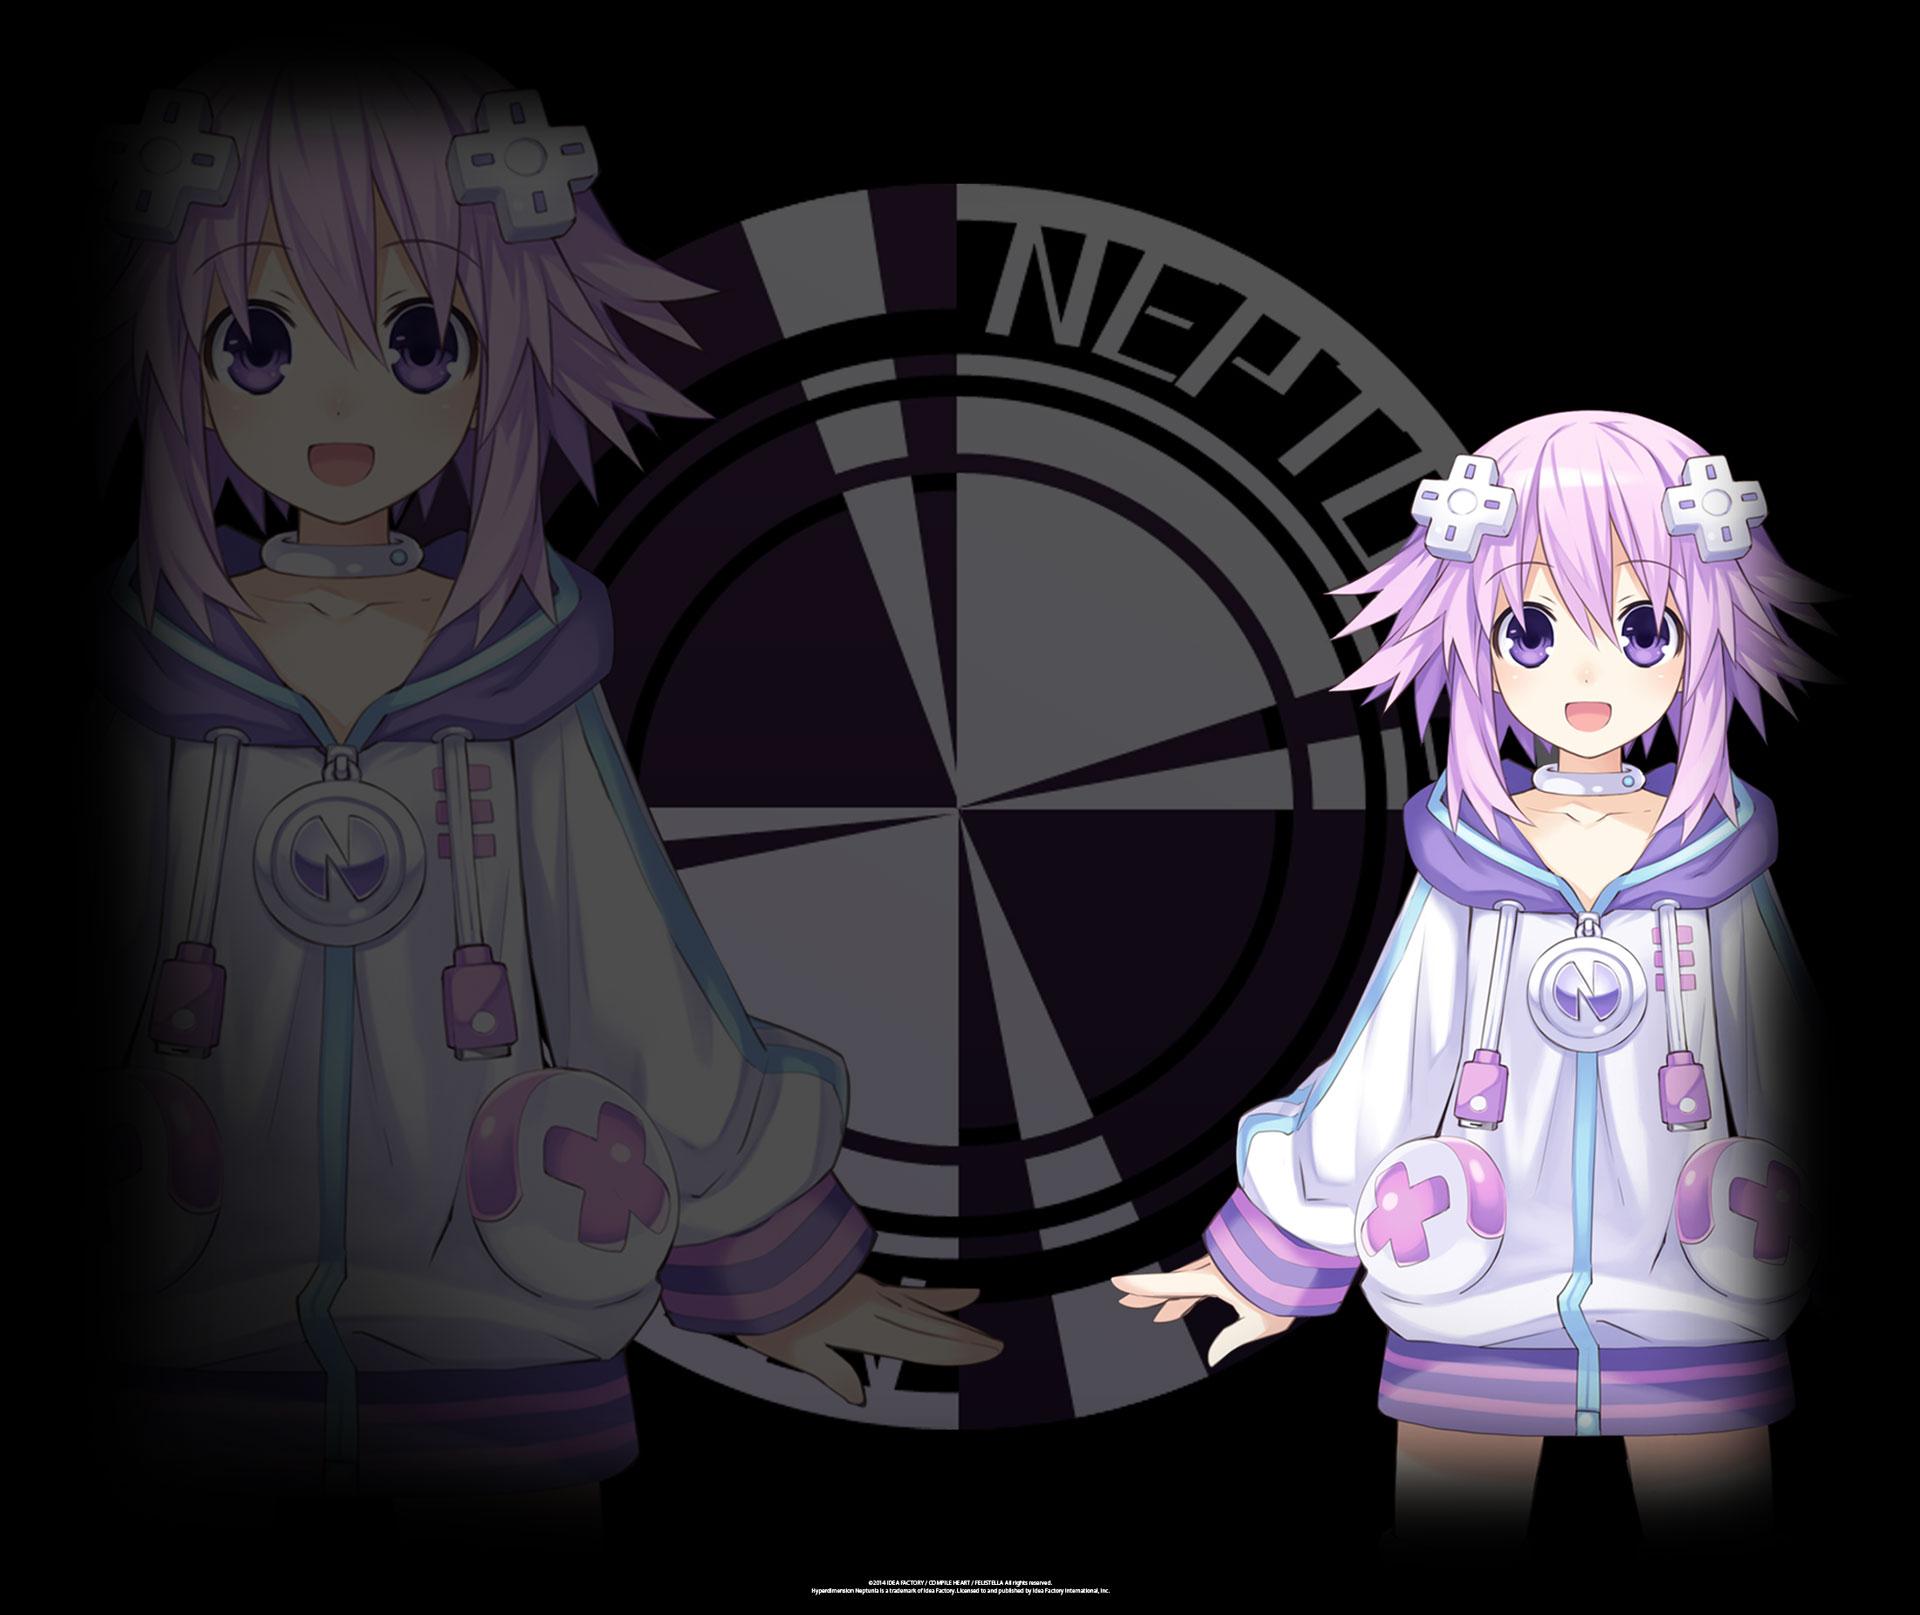 Steam Community Market Listings For 282900 Neptune Profile Background